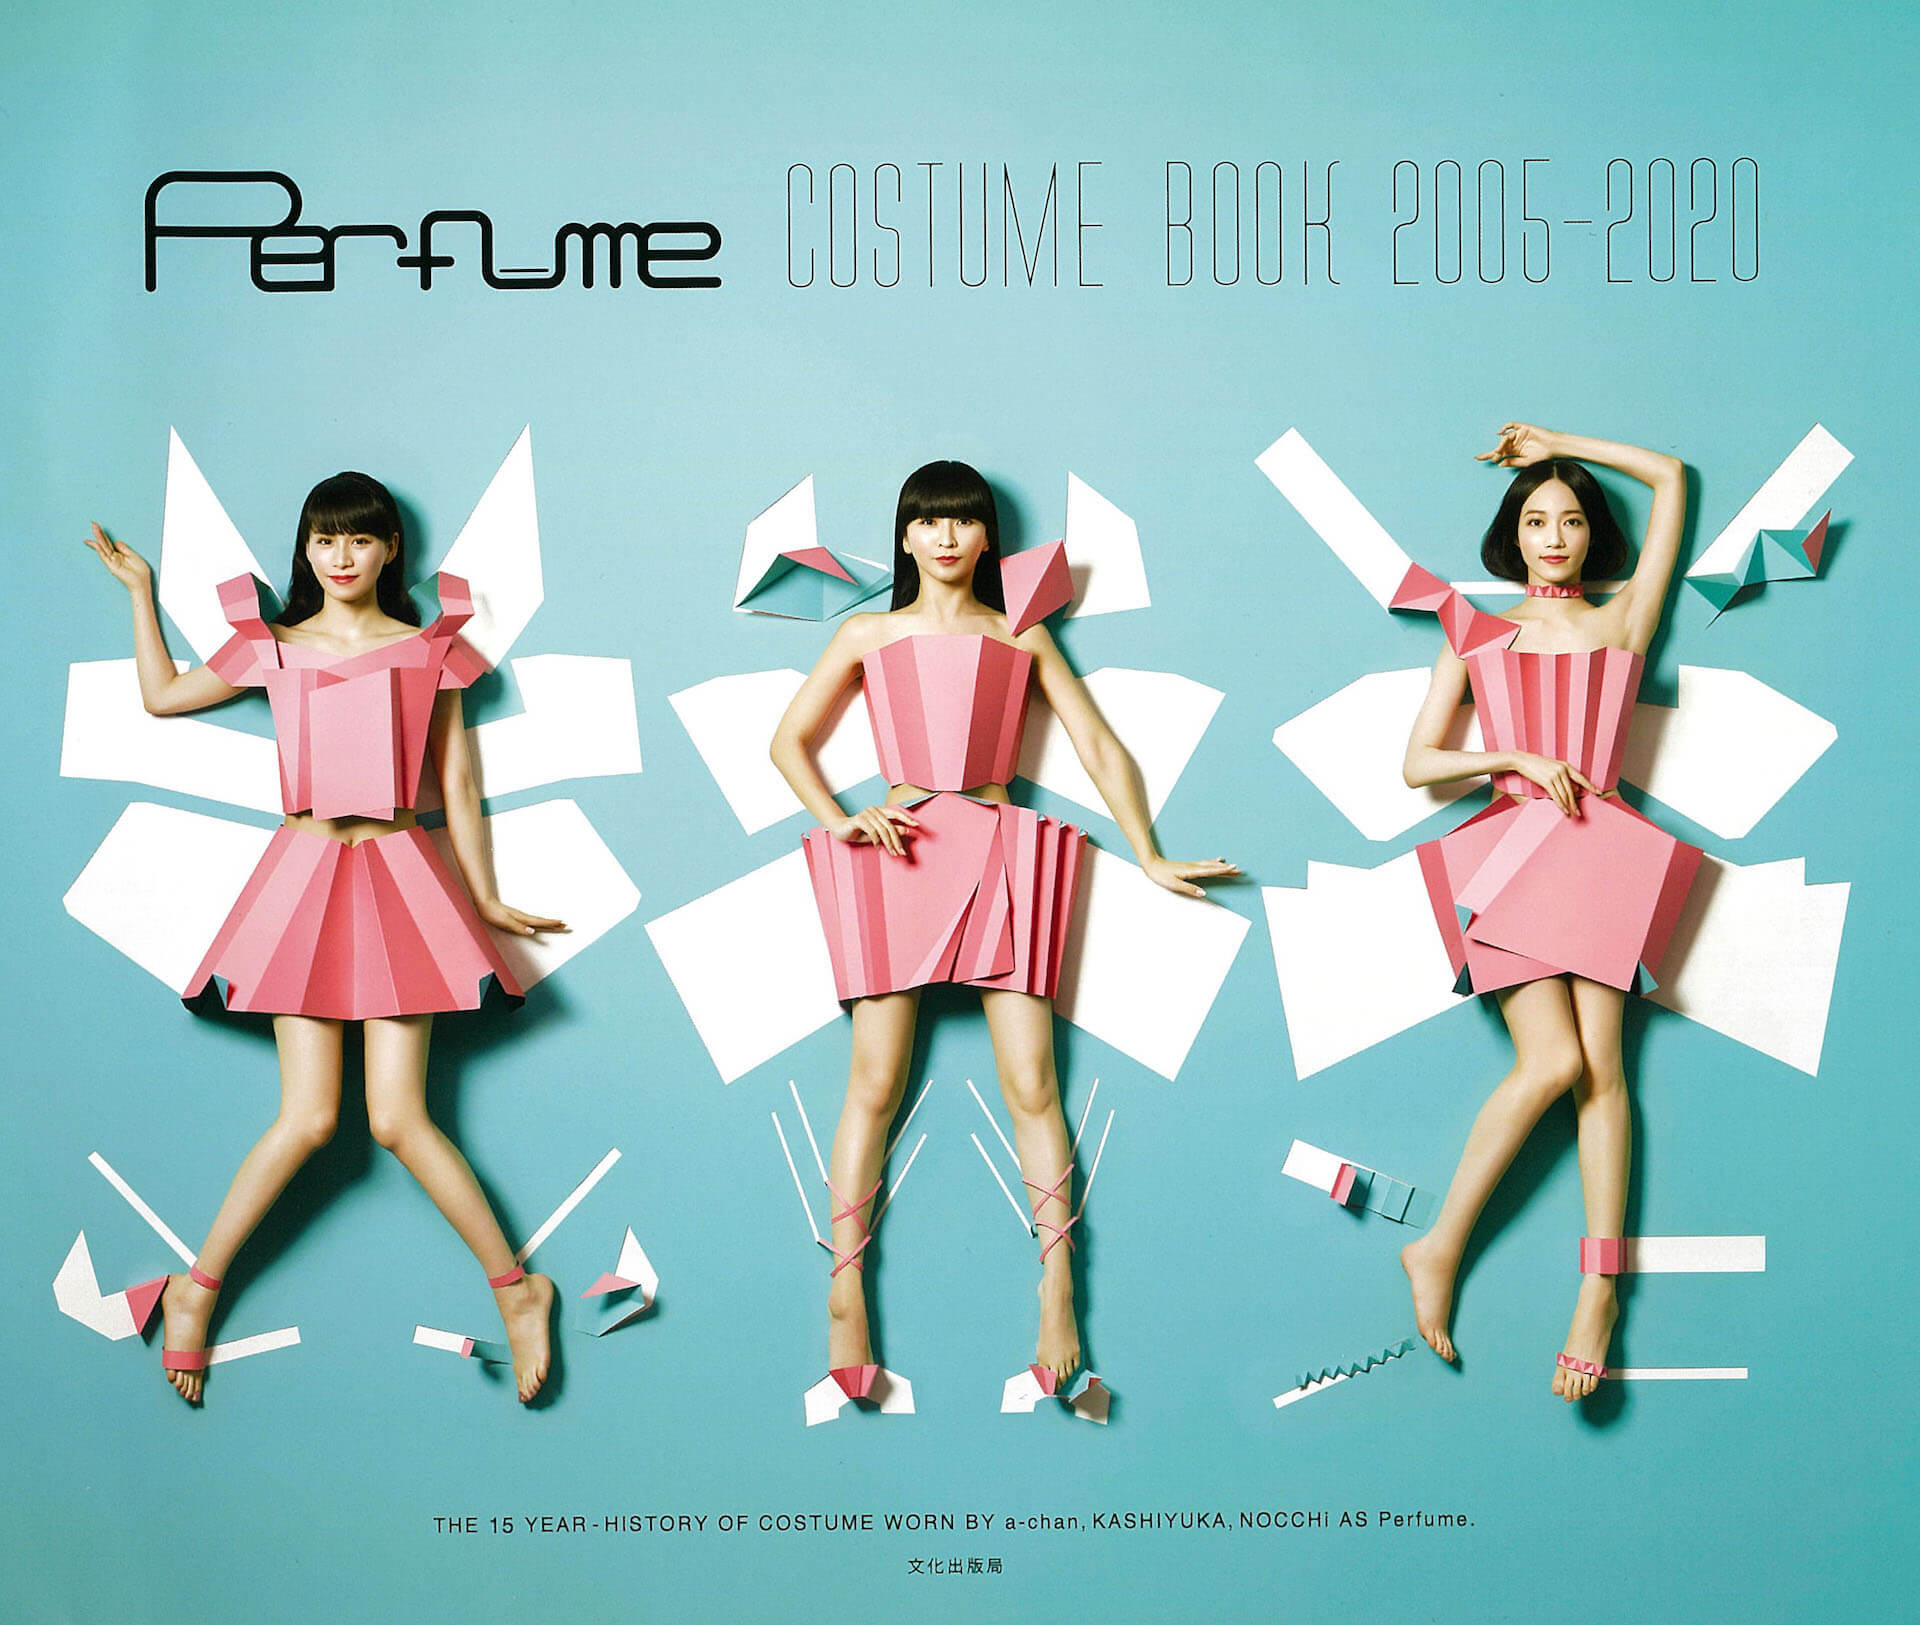 Perfume初の衣装本が『Perfume COSTUME BOOK 2005-2020』発売決定!6つの周年事業すべて発表 music200918_perfume_1